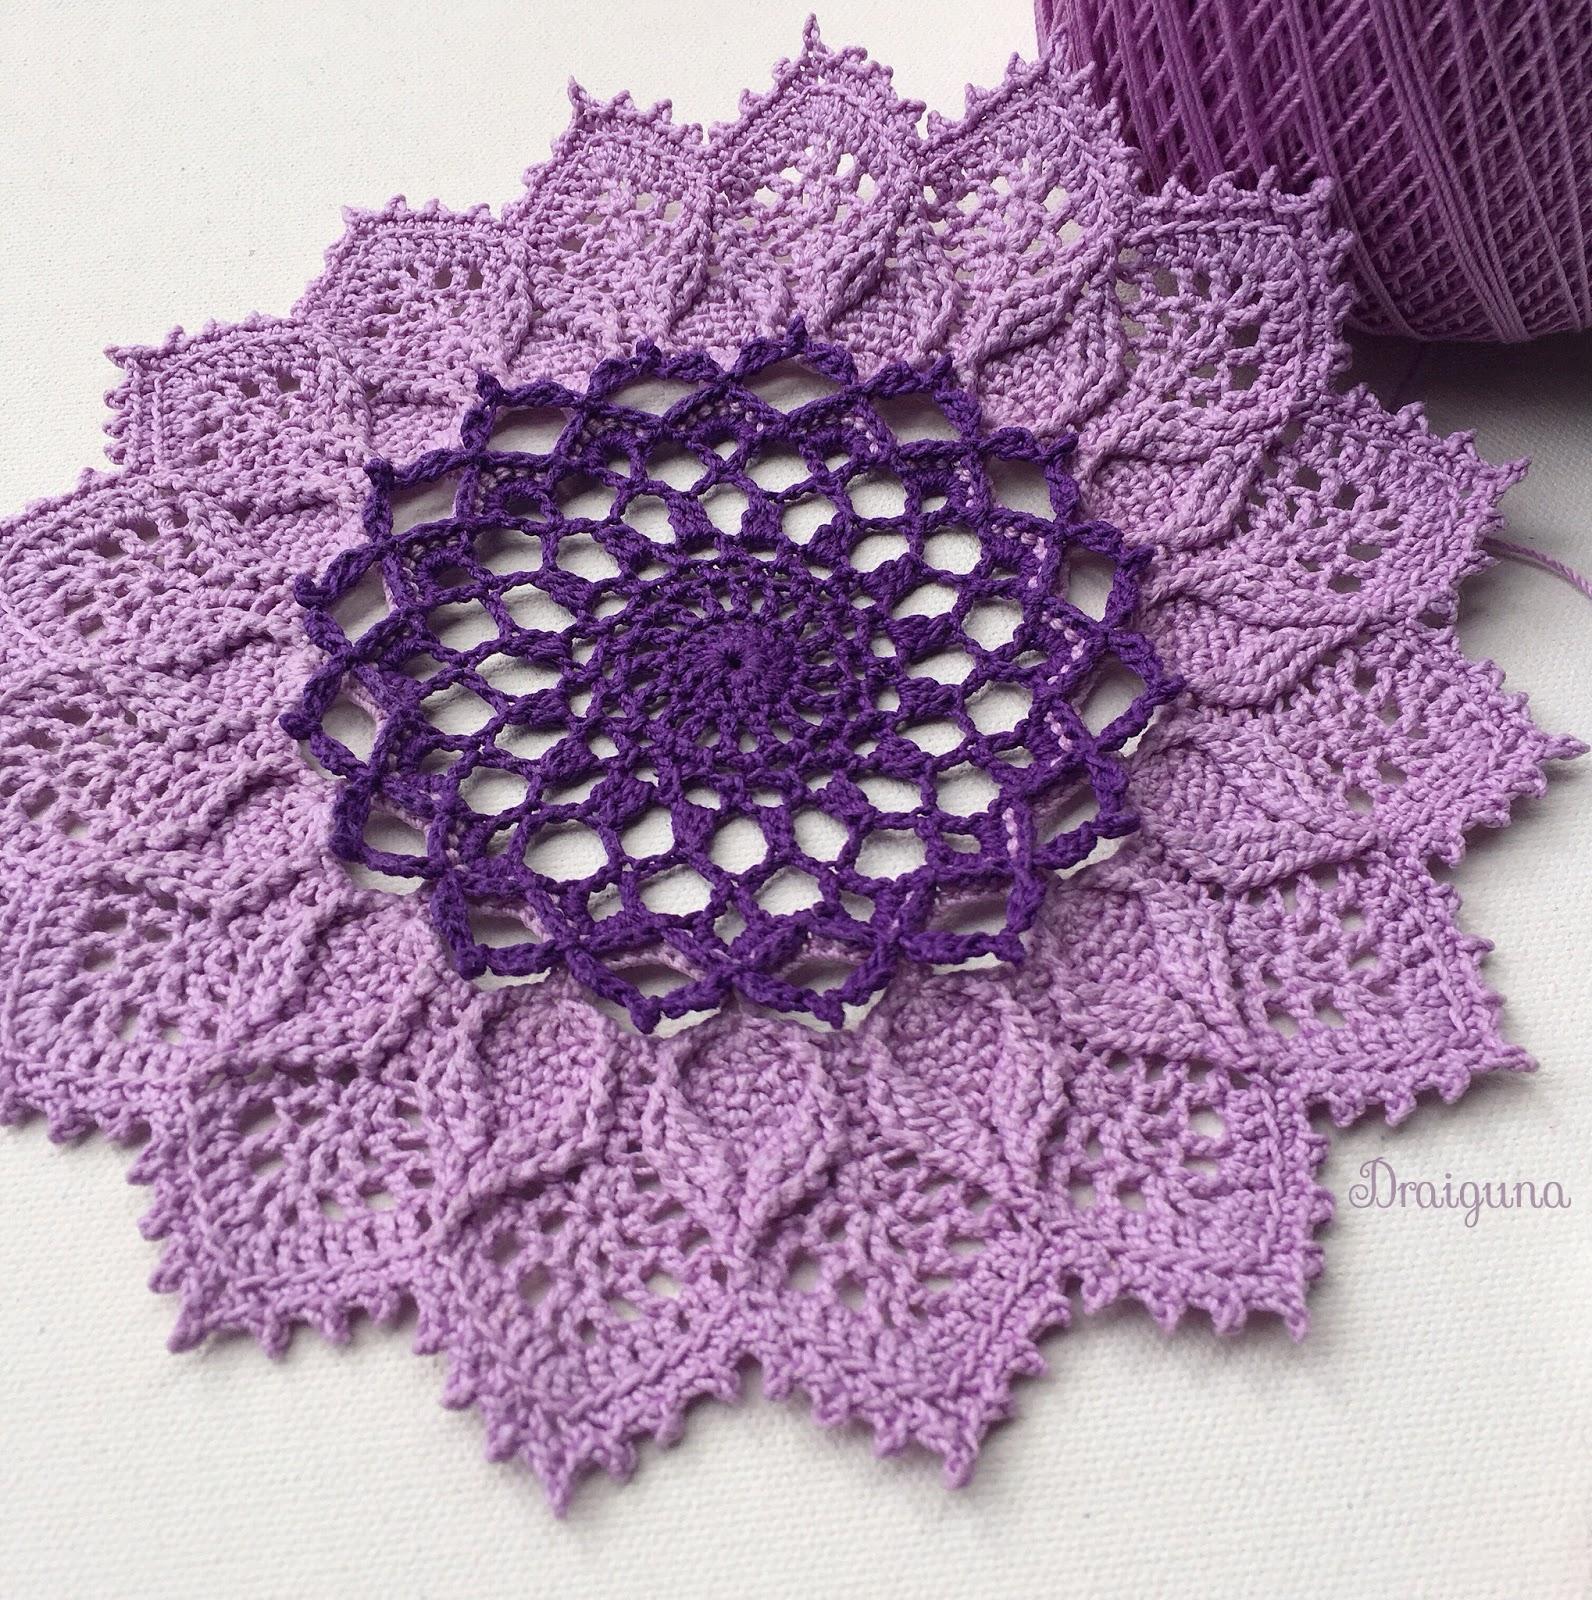 Draiguna Arcanoweave Part 2 Free Crochet Doily Patterns